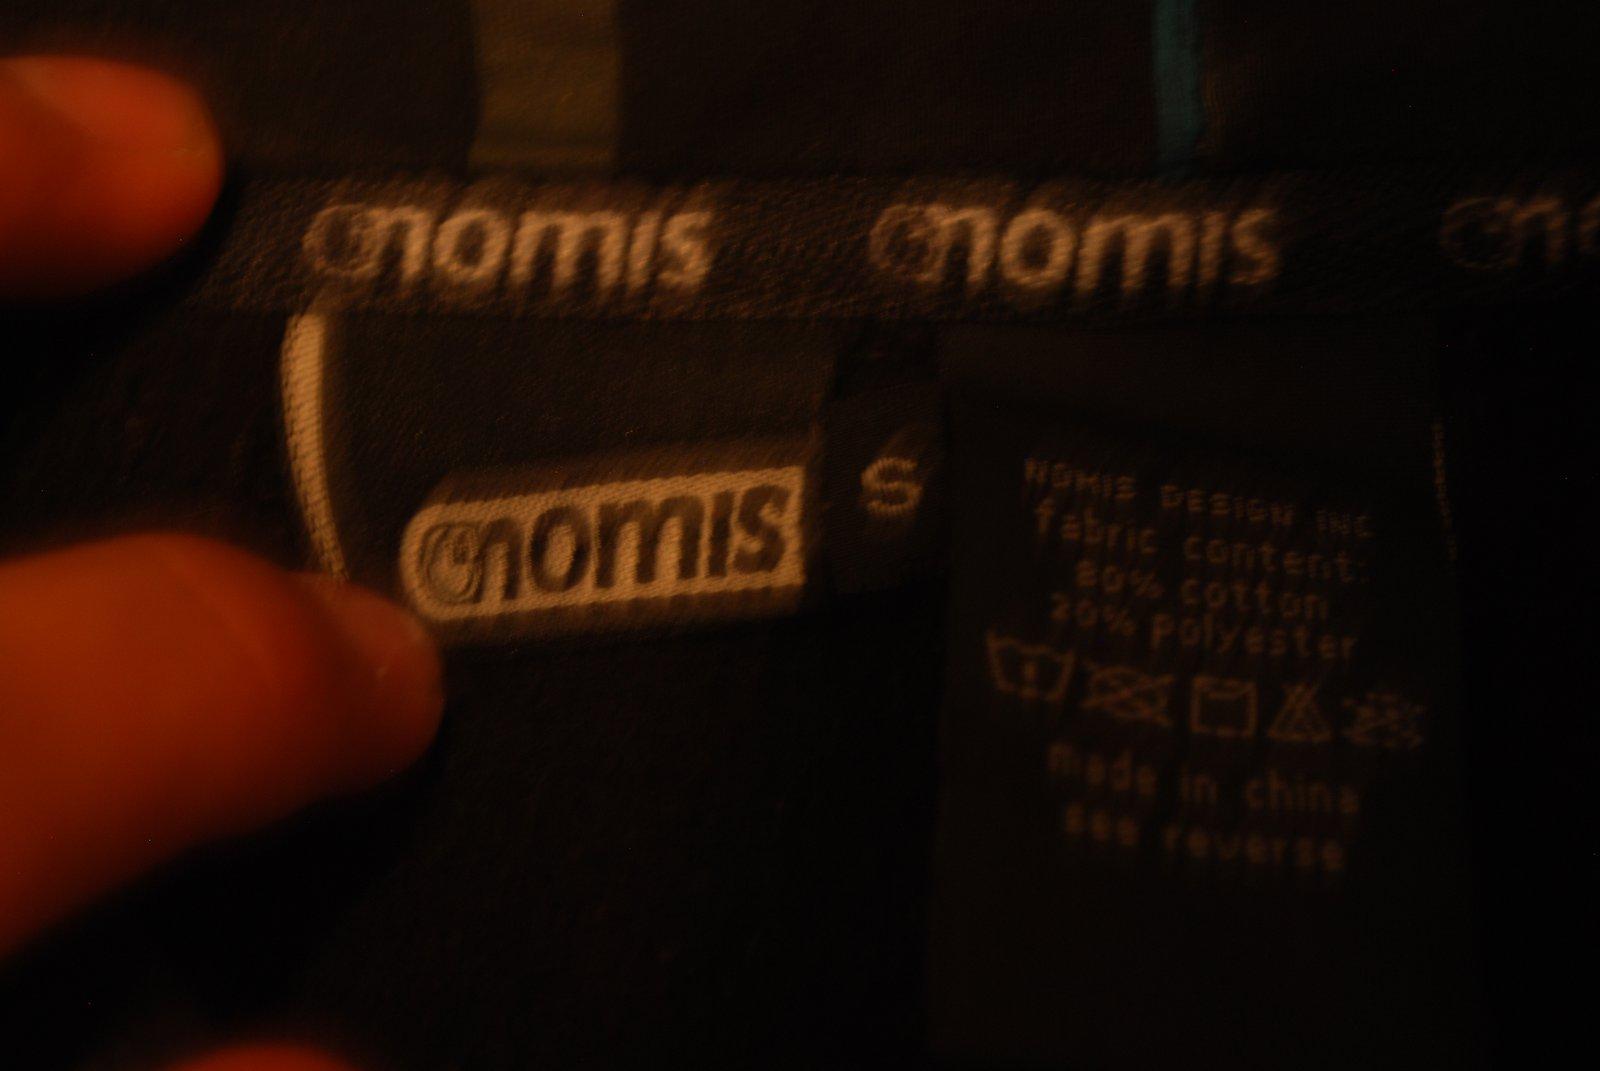 Nomis hoodie size S